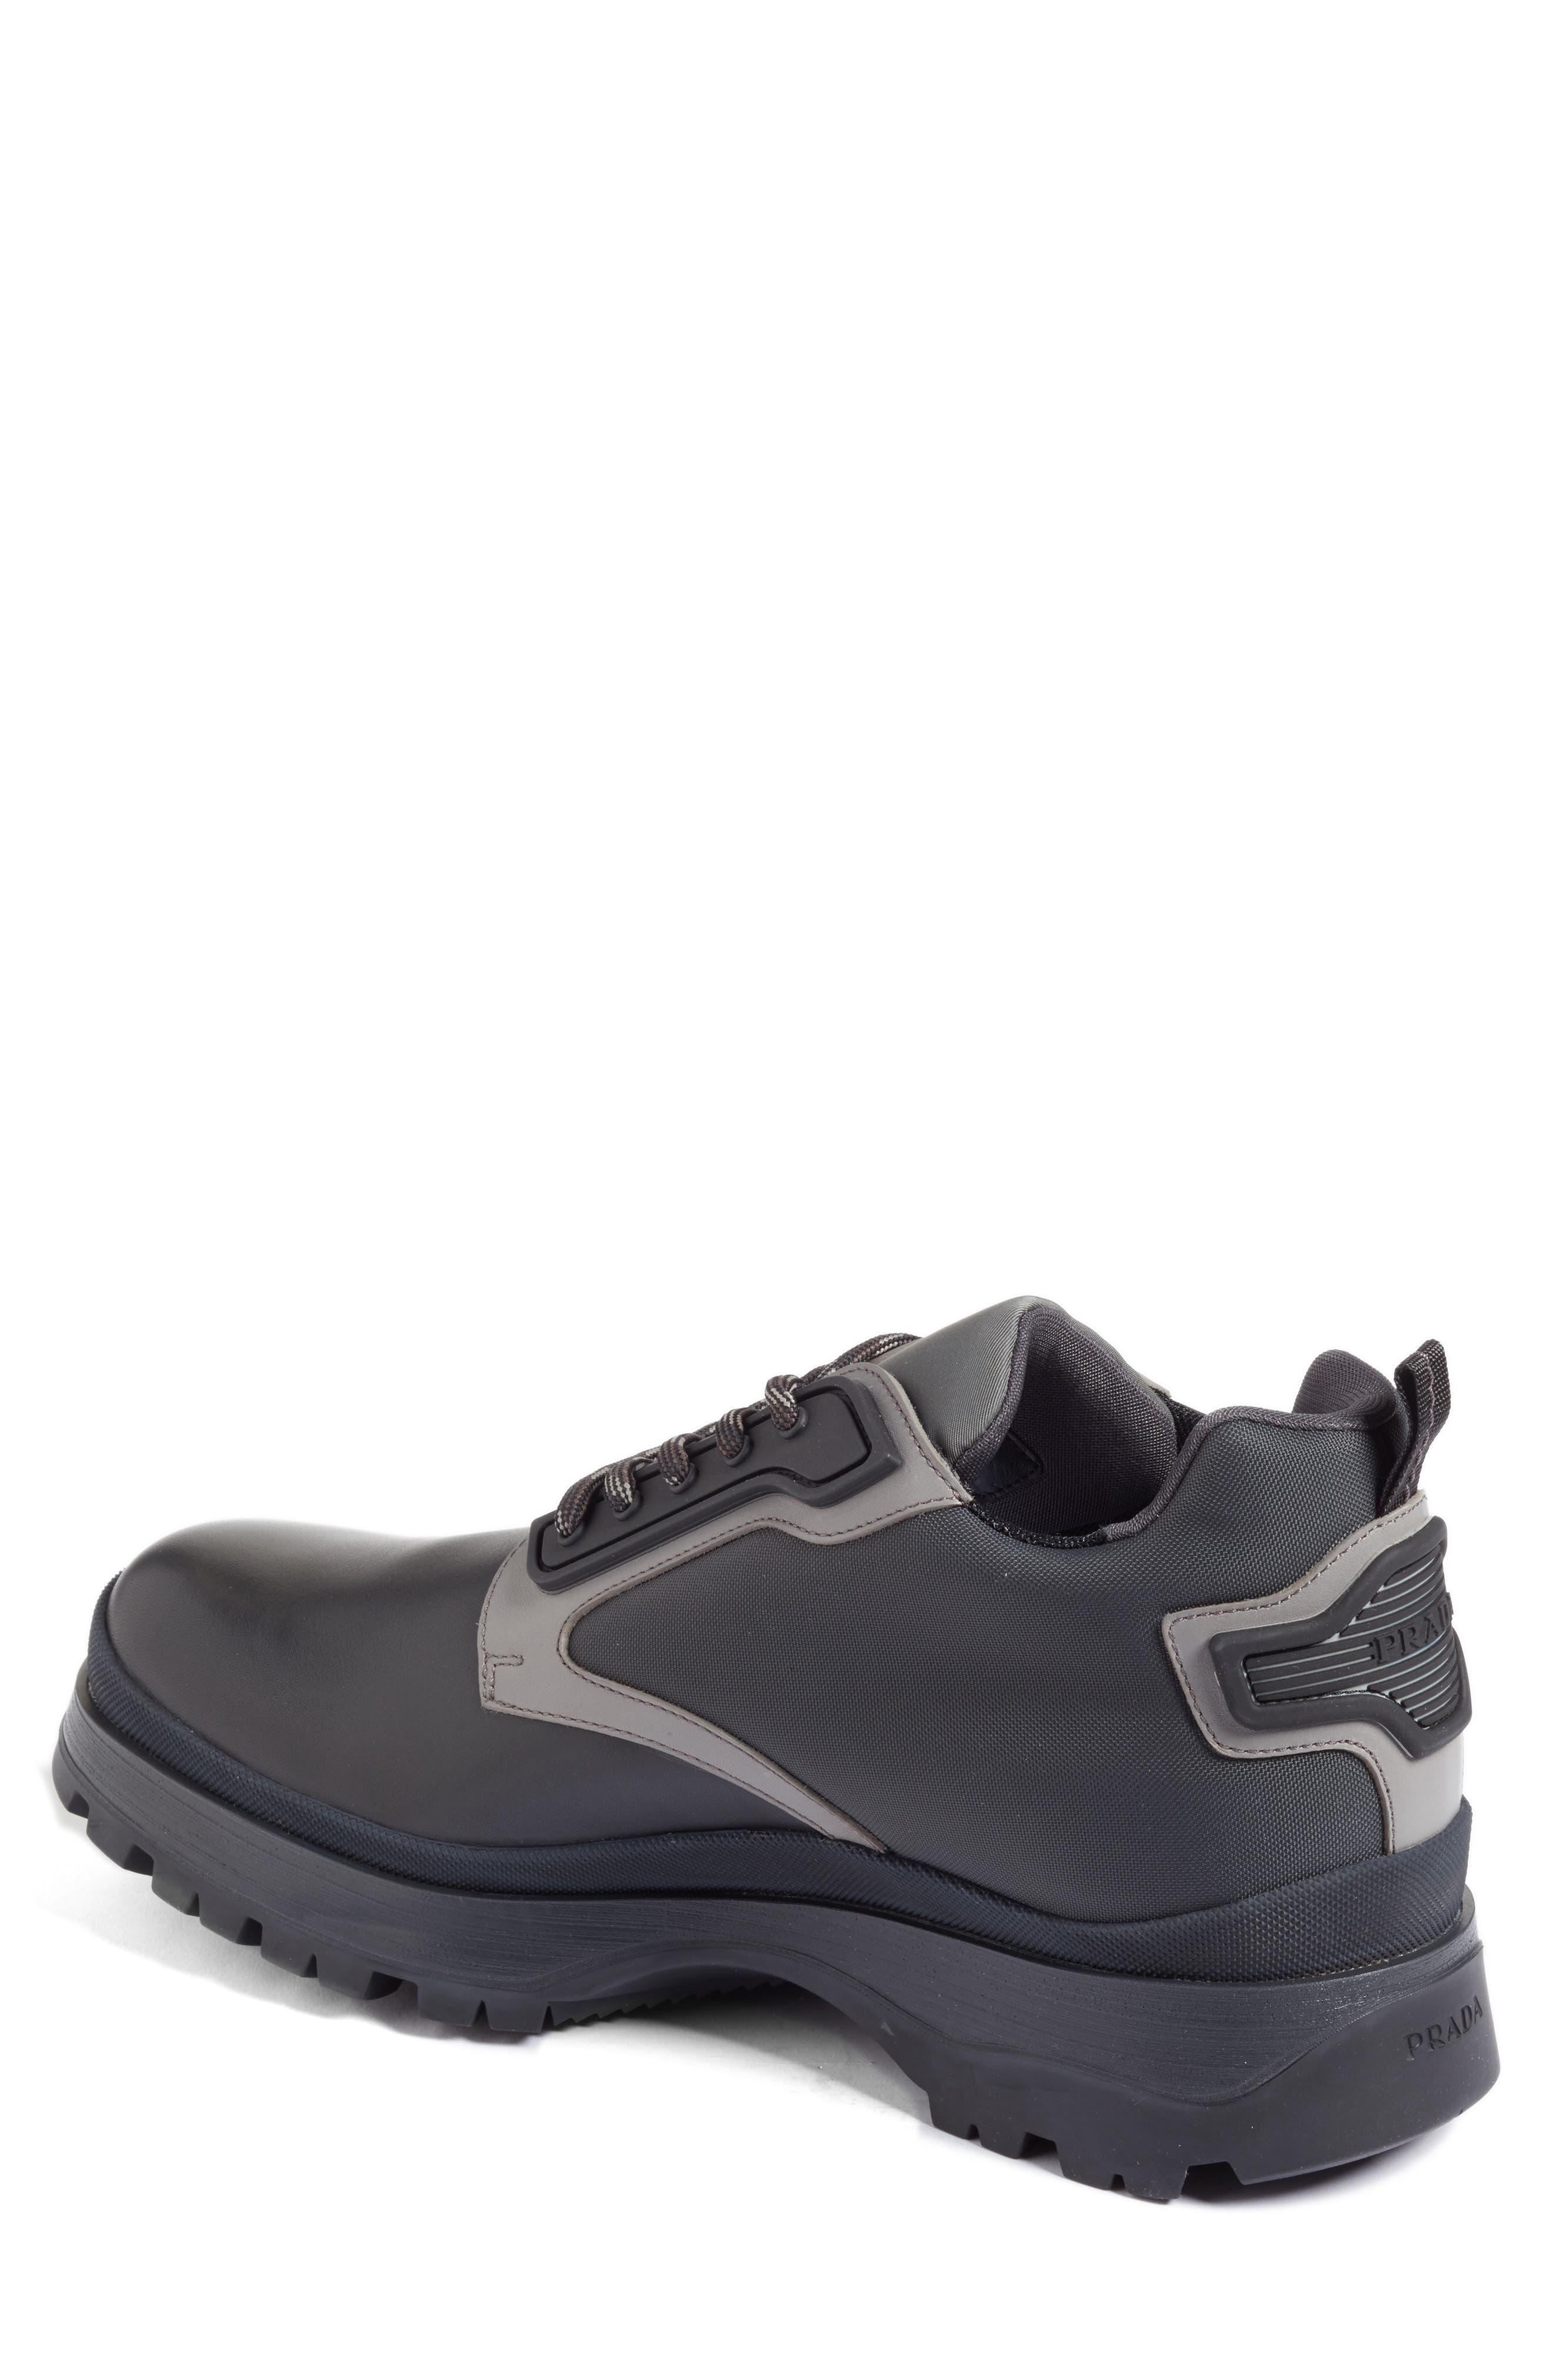 Tech Sneaker Boot,                             Alternate thumbnail 2, color,                             007